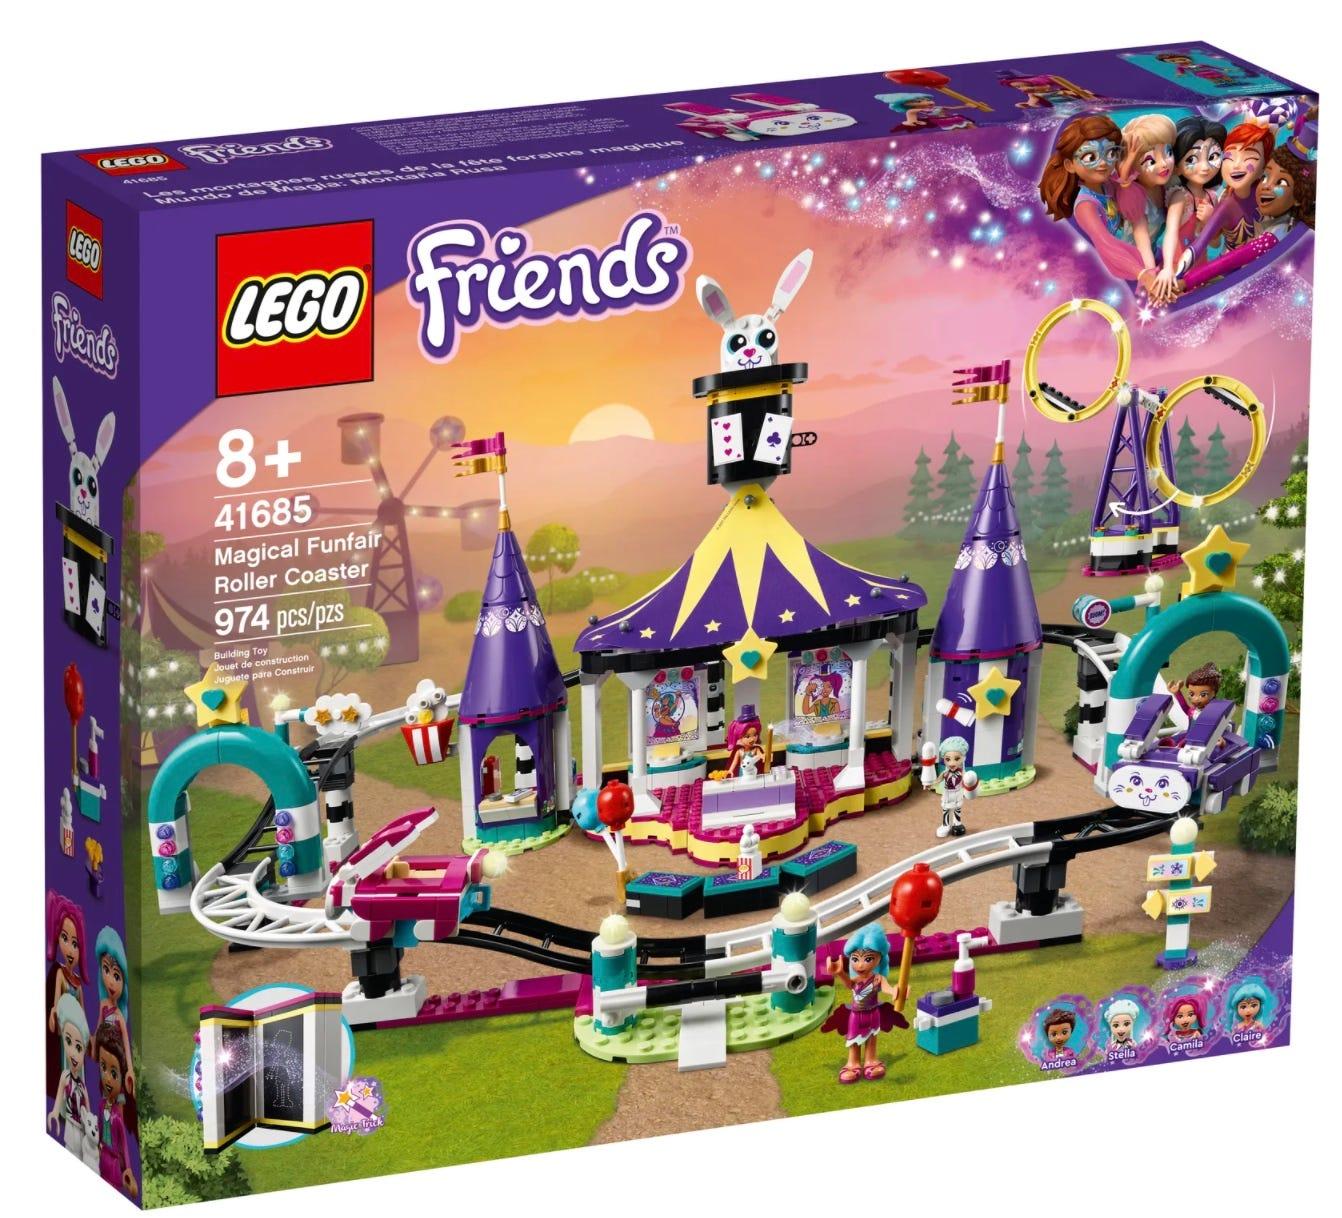 LEGO Magical Funfair Roller Coaster